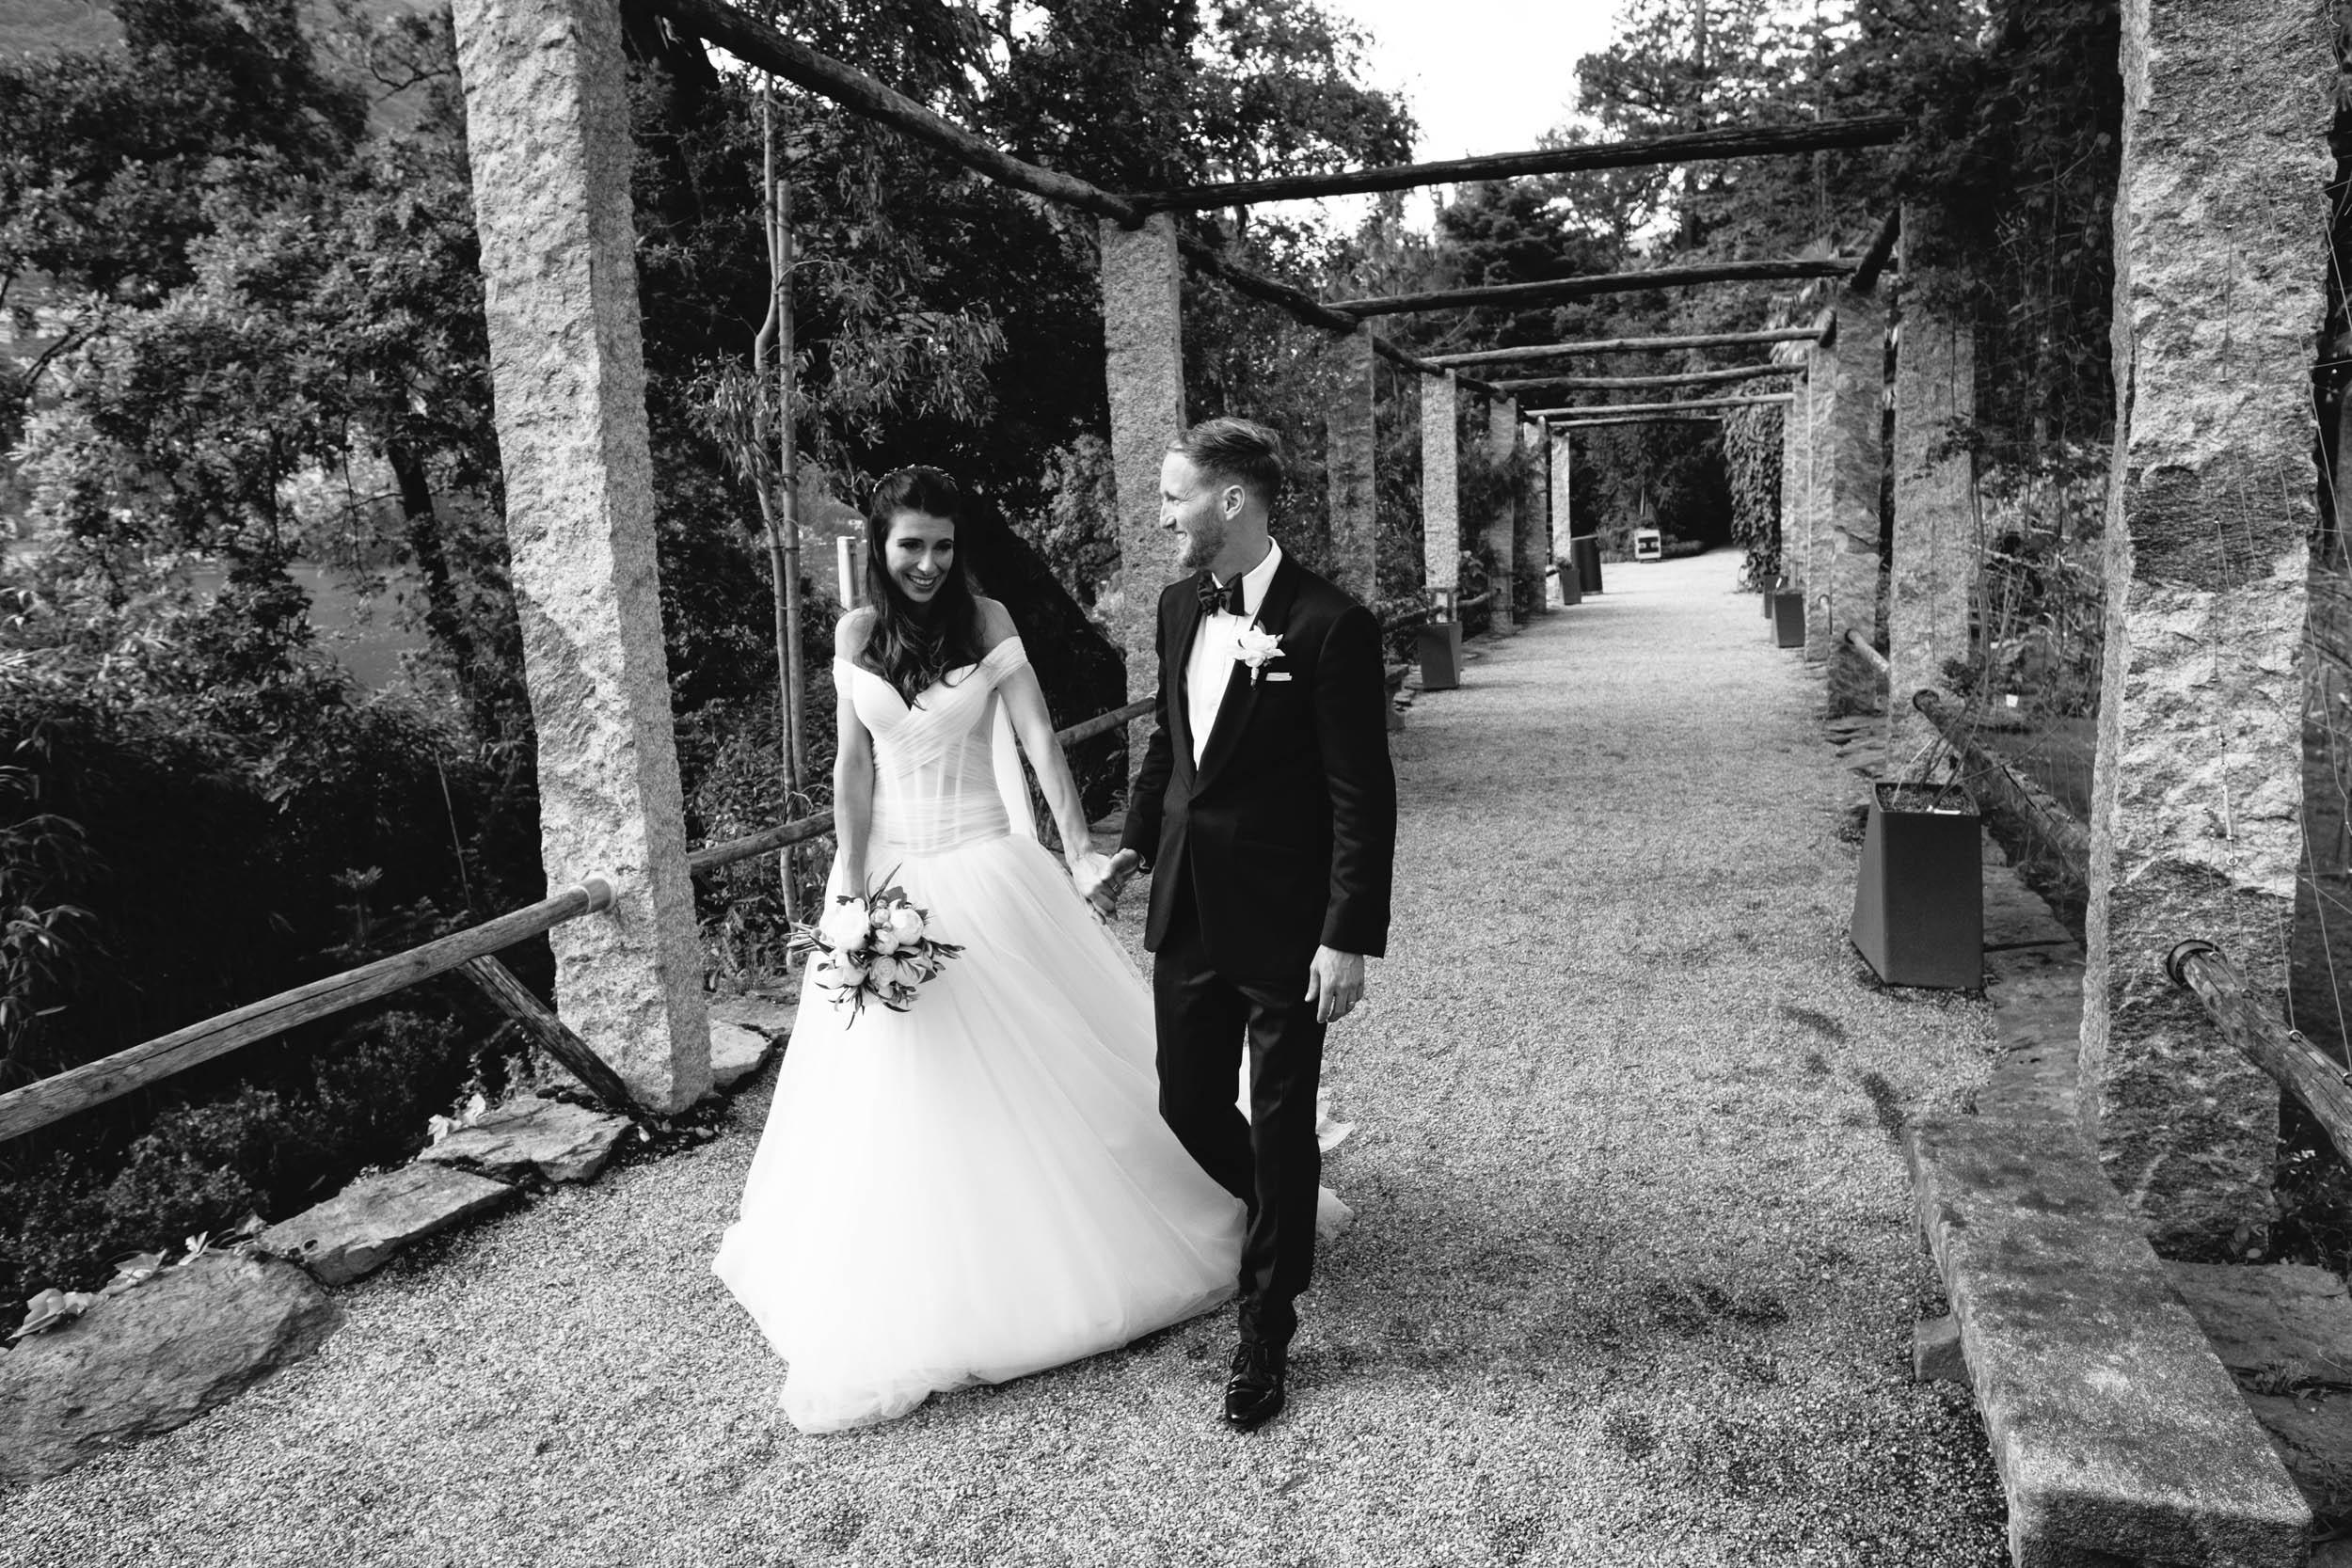 olivia-andreas-wedding-switzerland-394.jpg